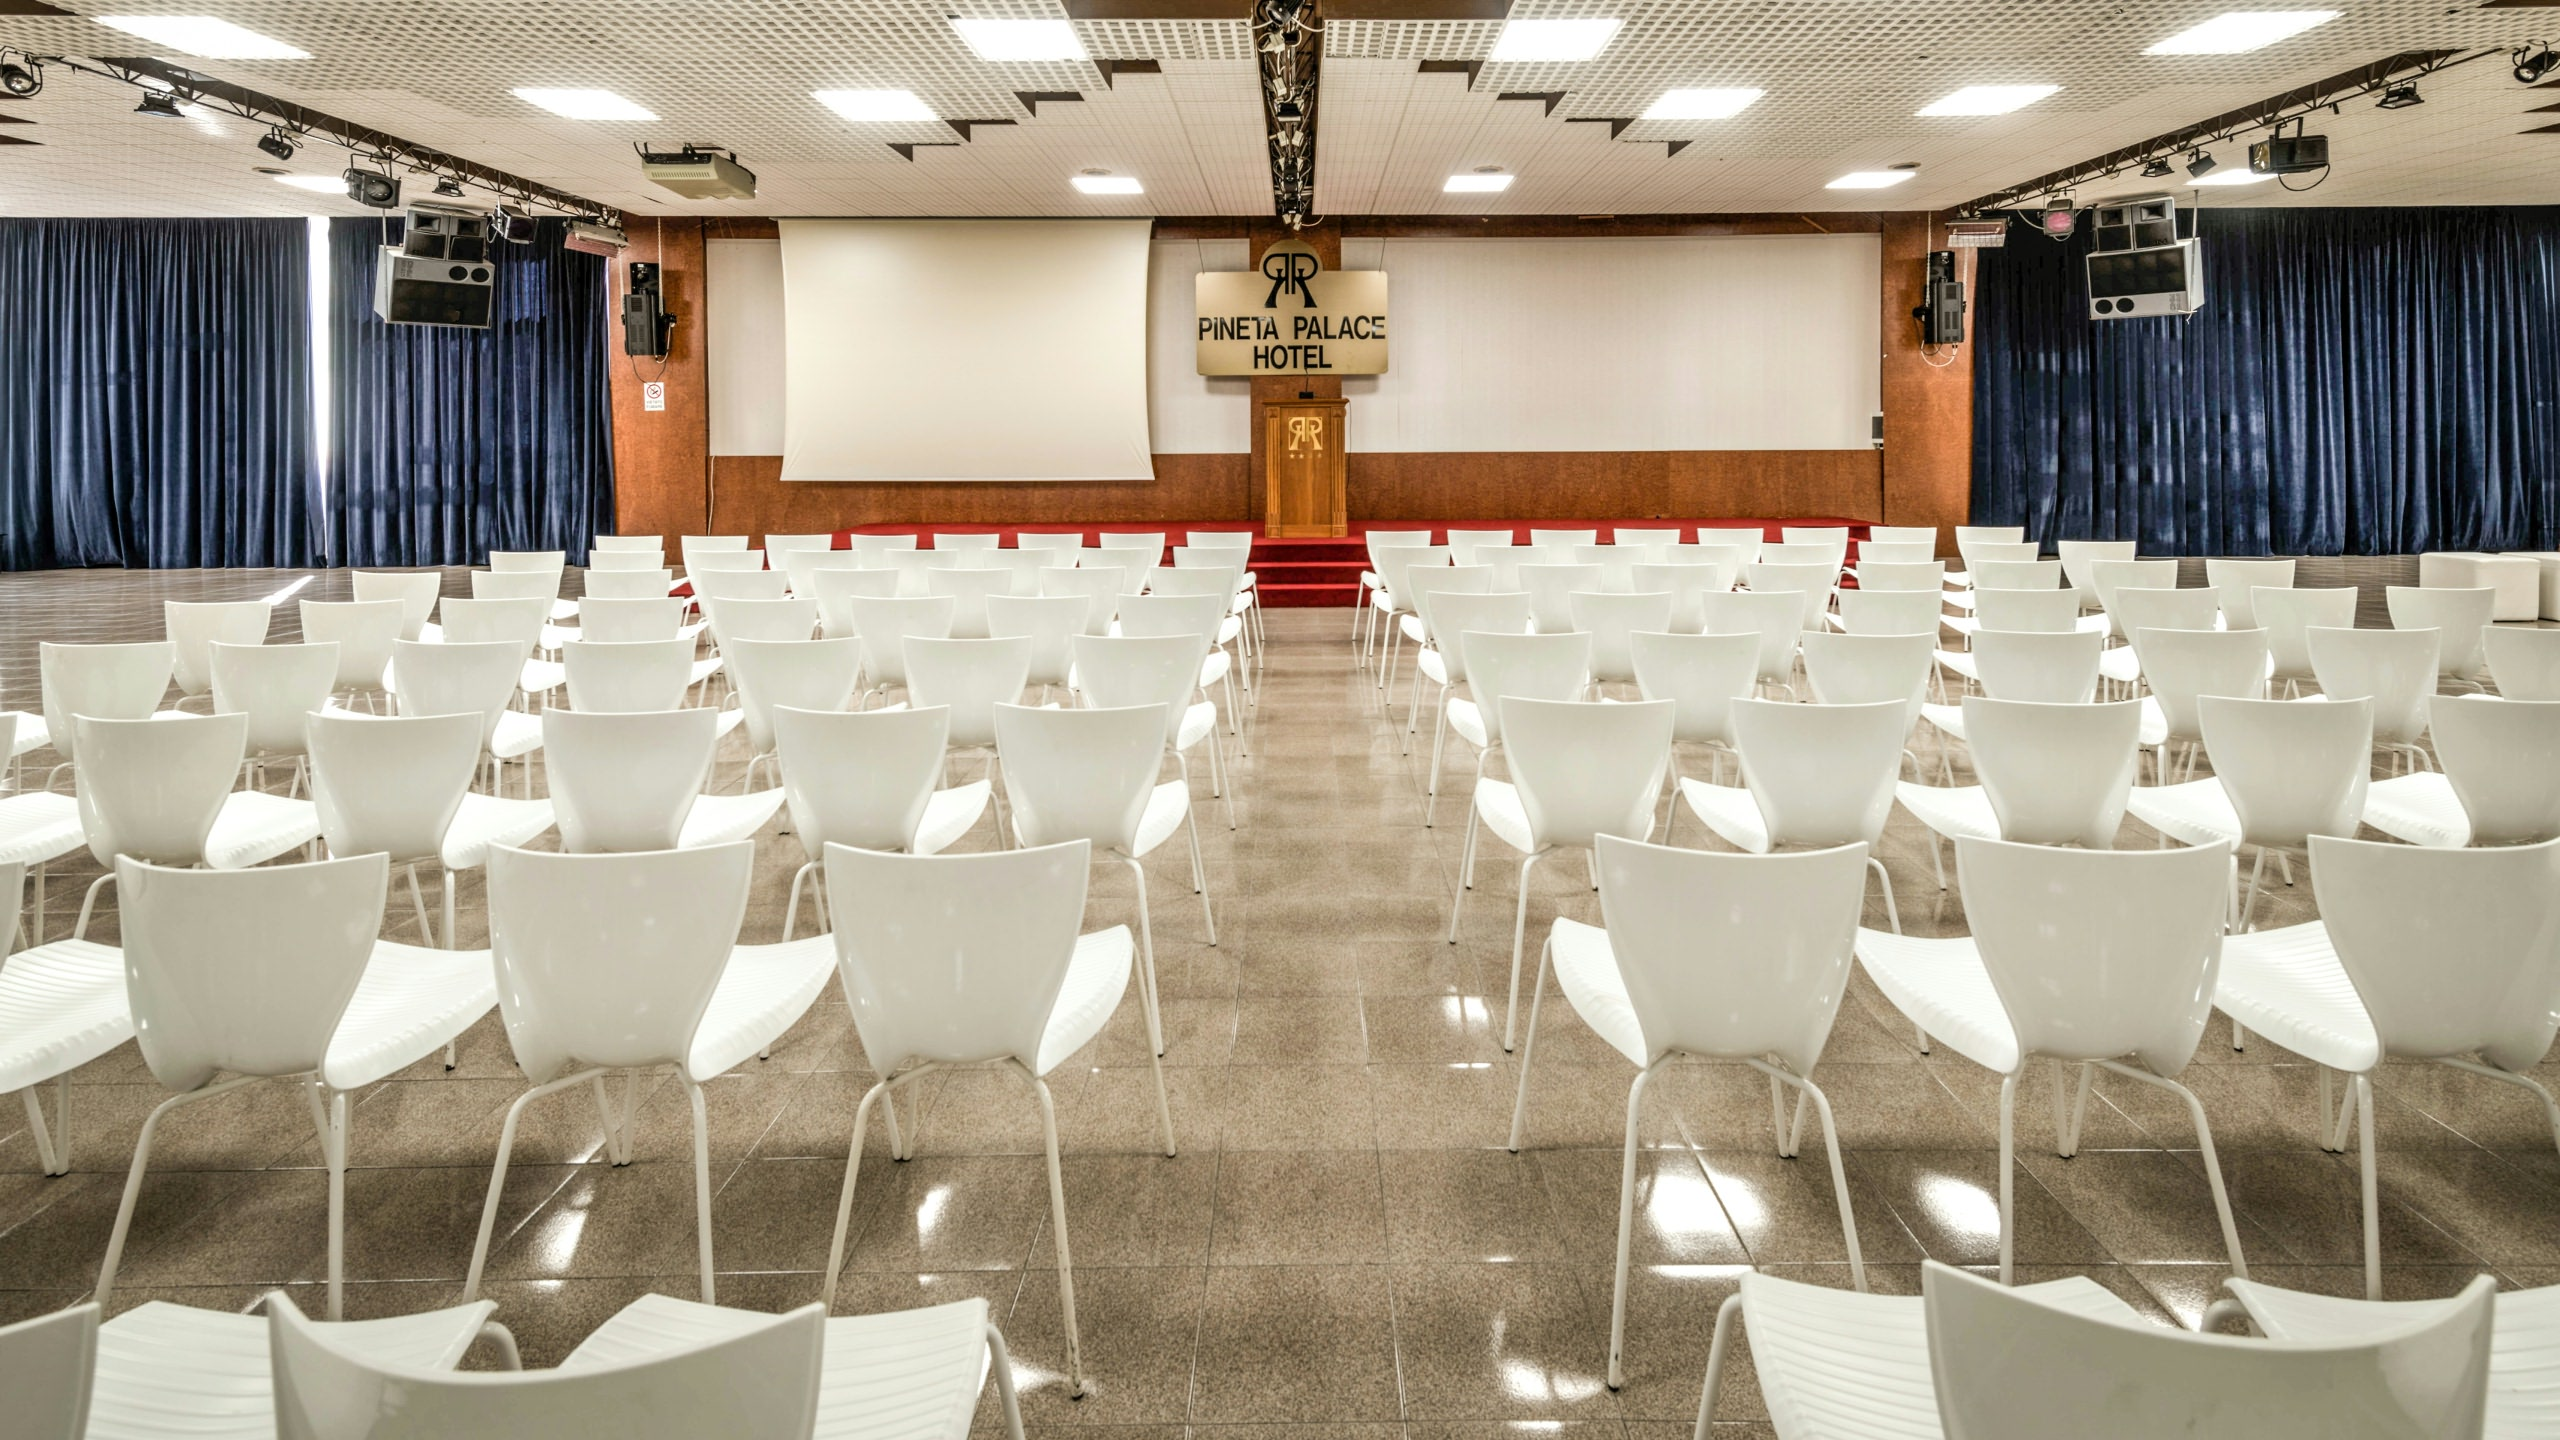 centro-congressi-pineta-palace-roma-1slide